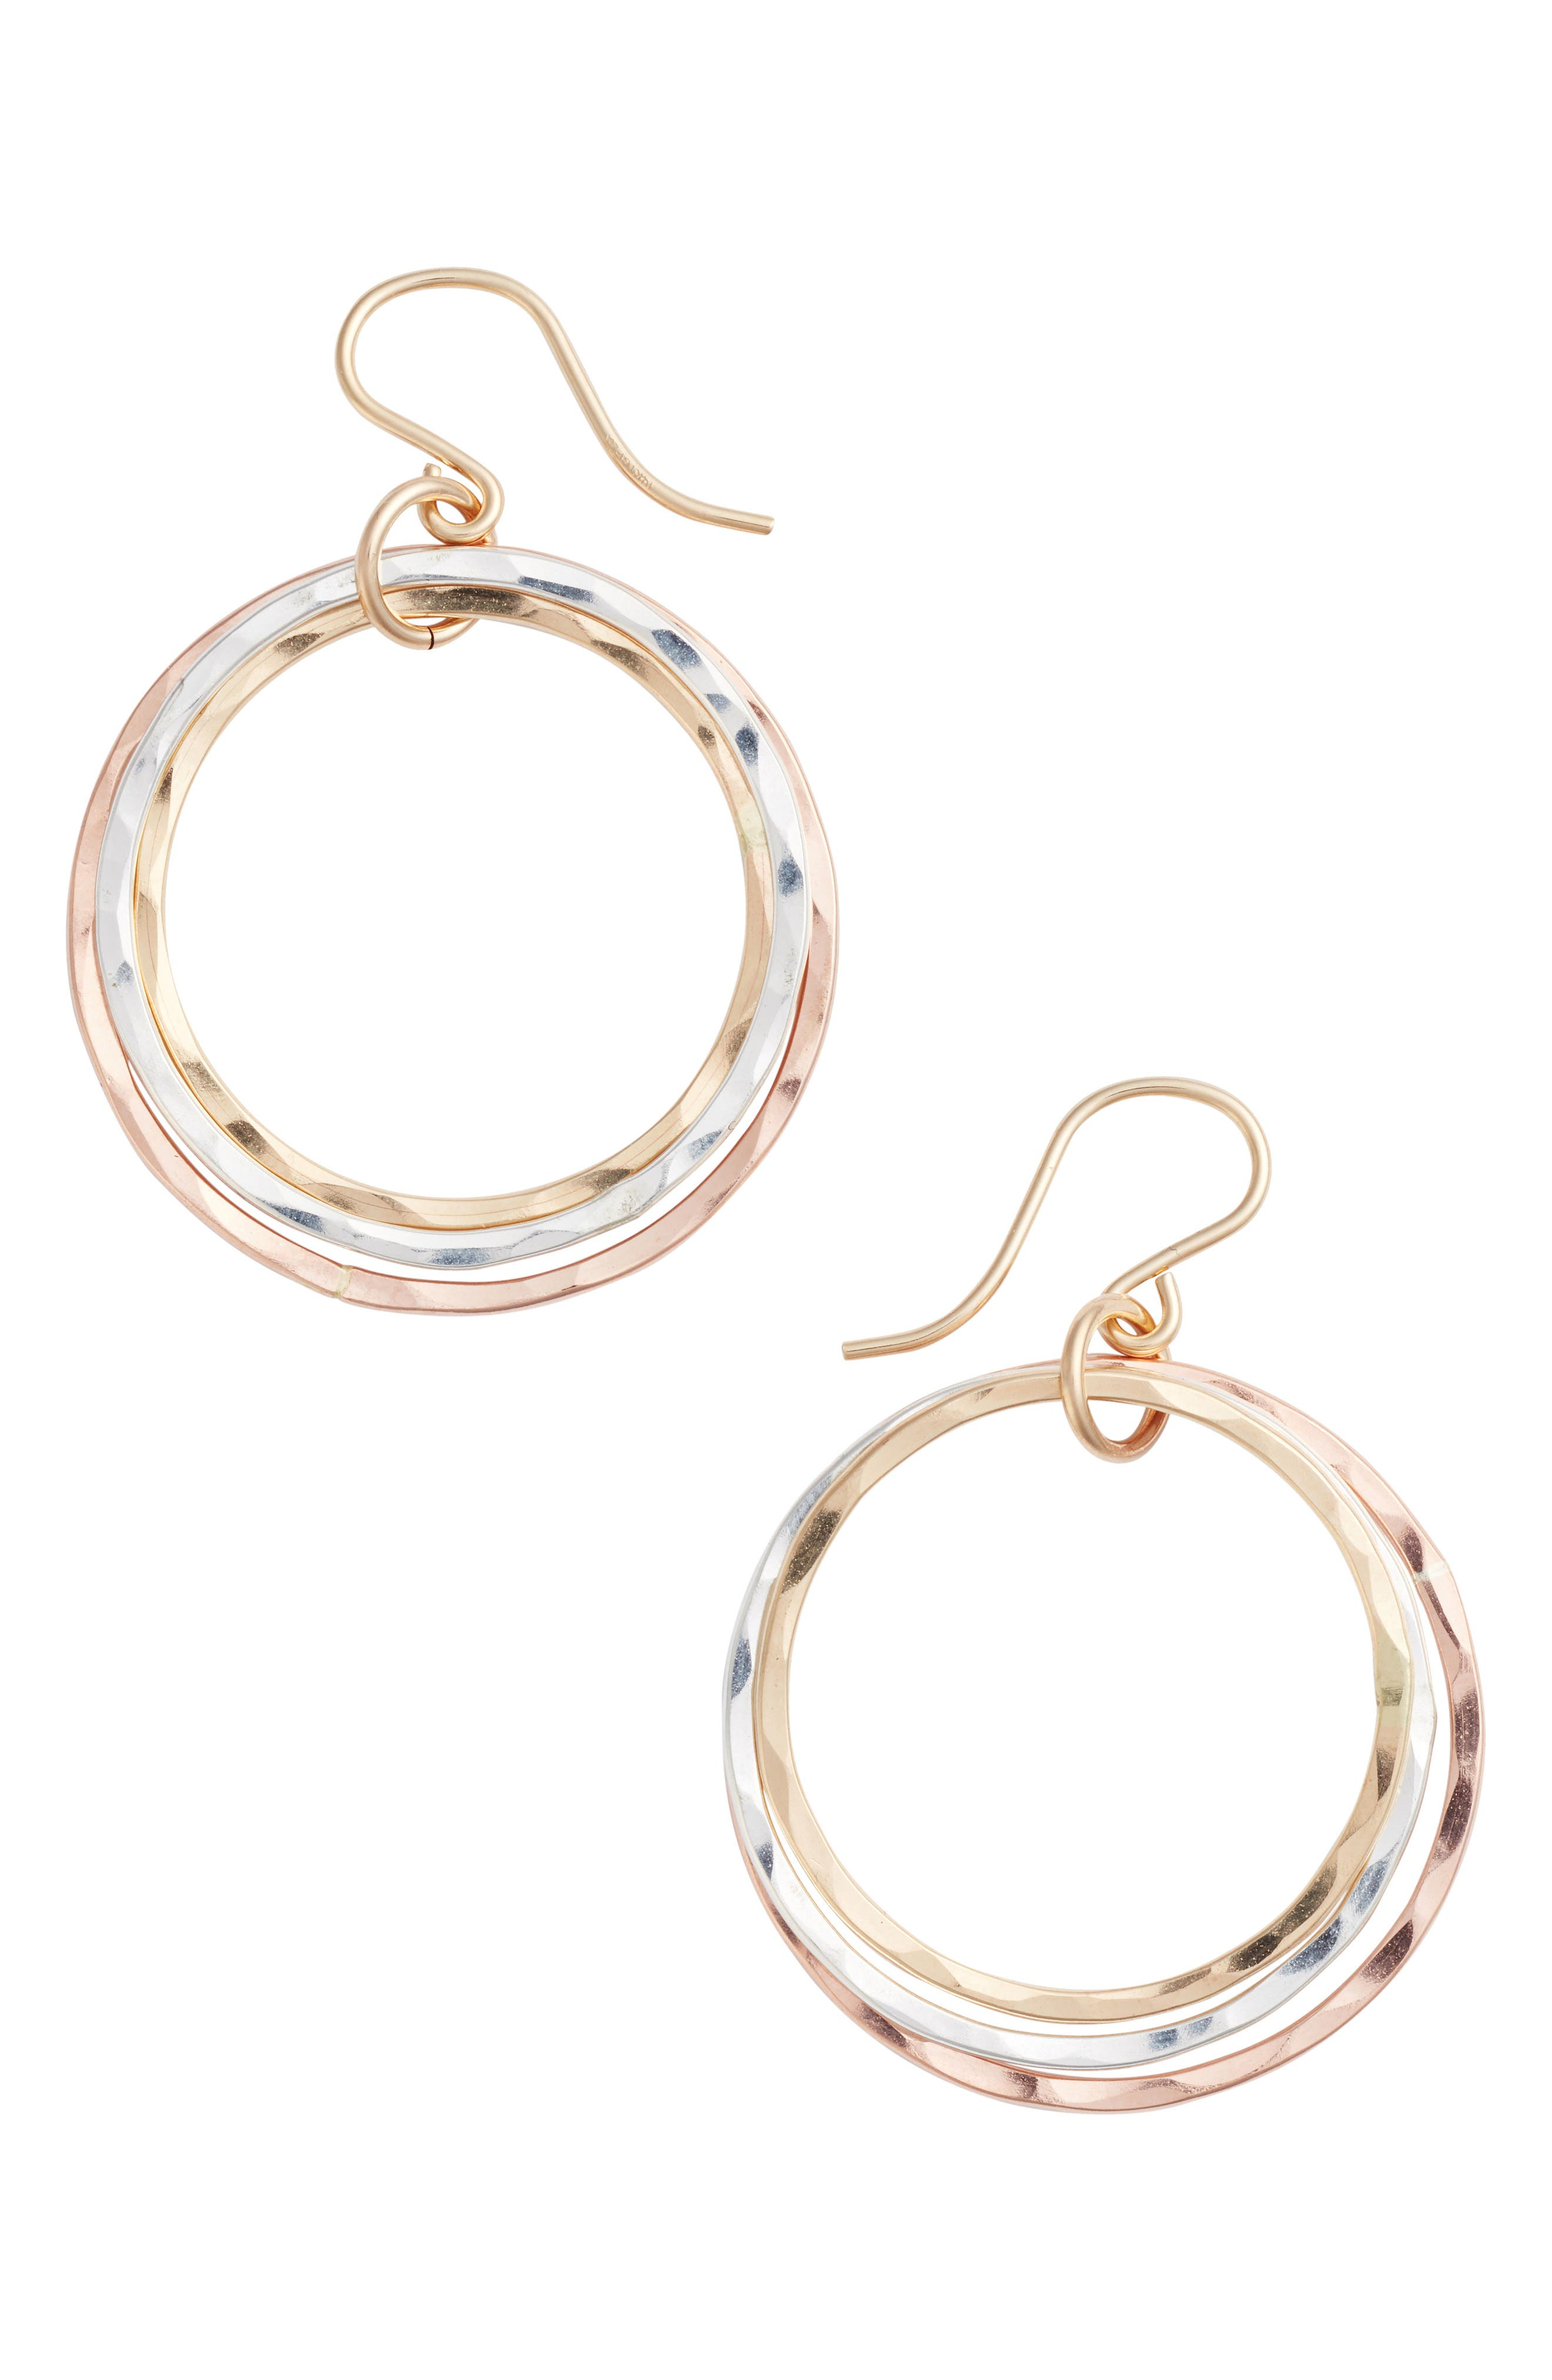 Wellness Small Hoop Earrings,                         Main,                         color, 715